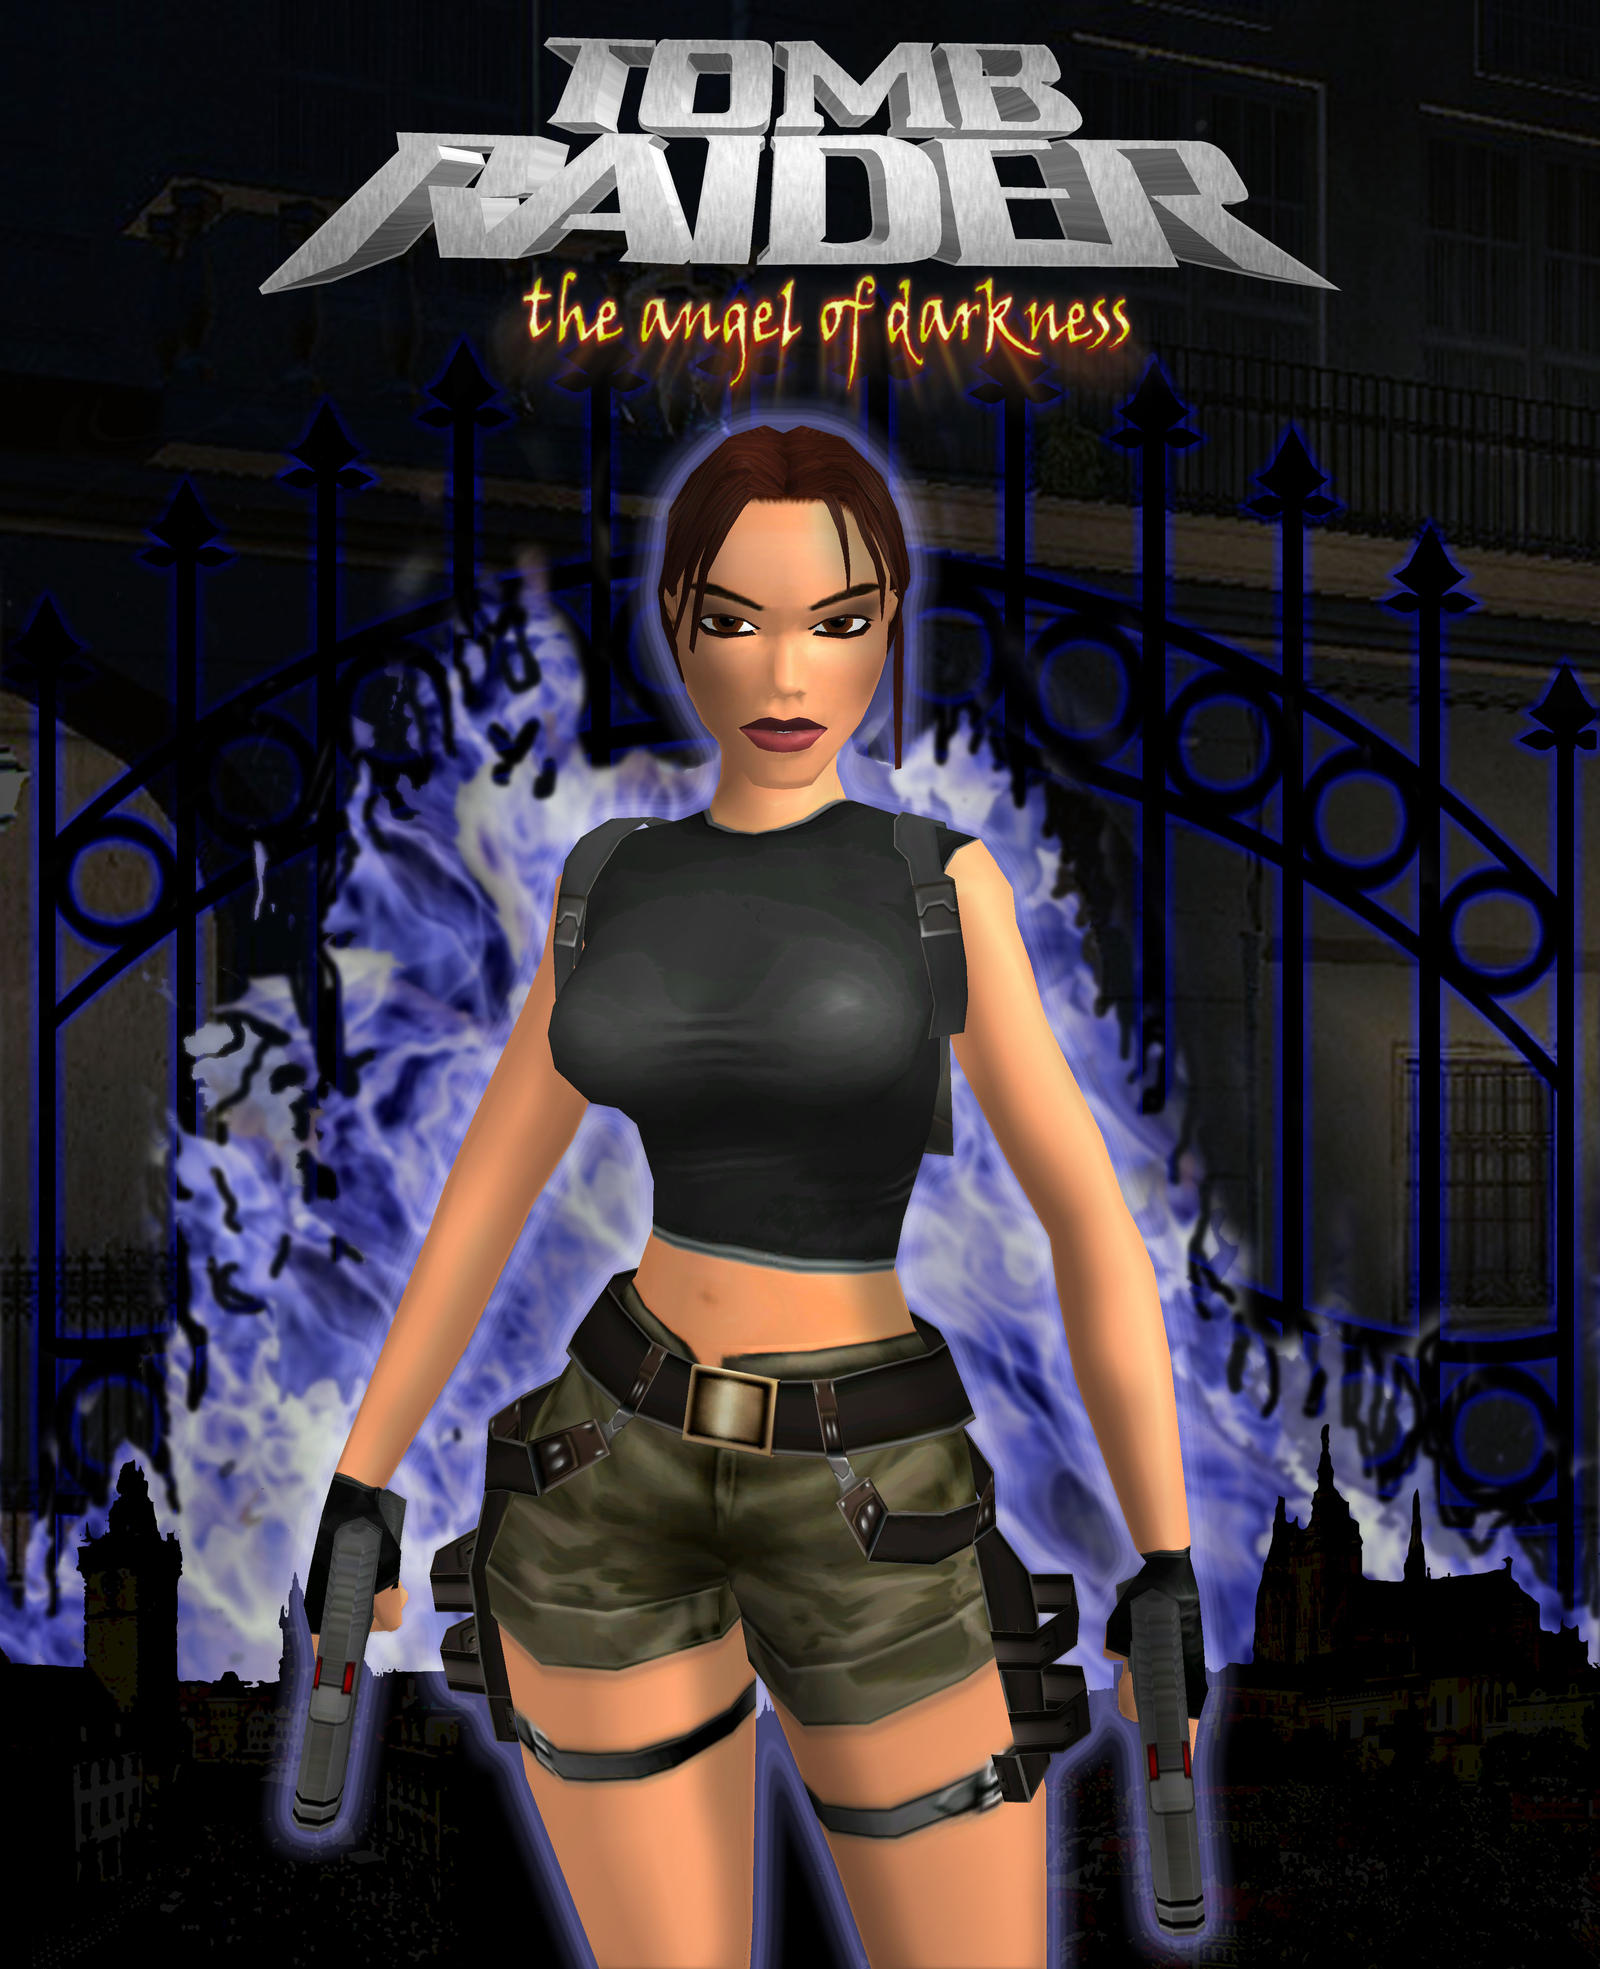 Tomb Rider Wallpaper: Tomb Raider Angel Of Darkness By Xara-TR On DeviantArt